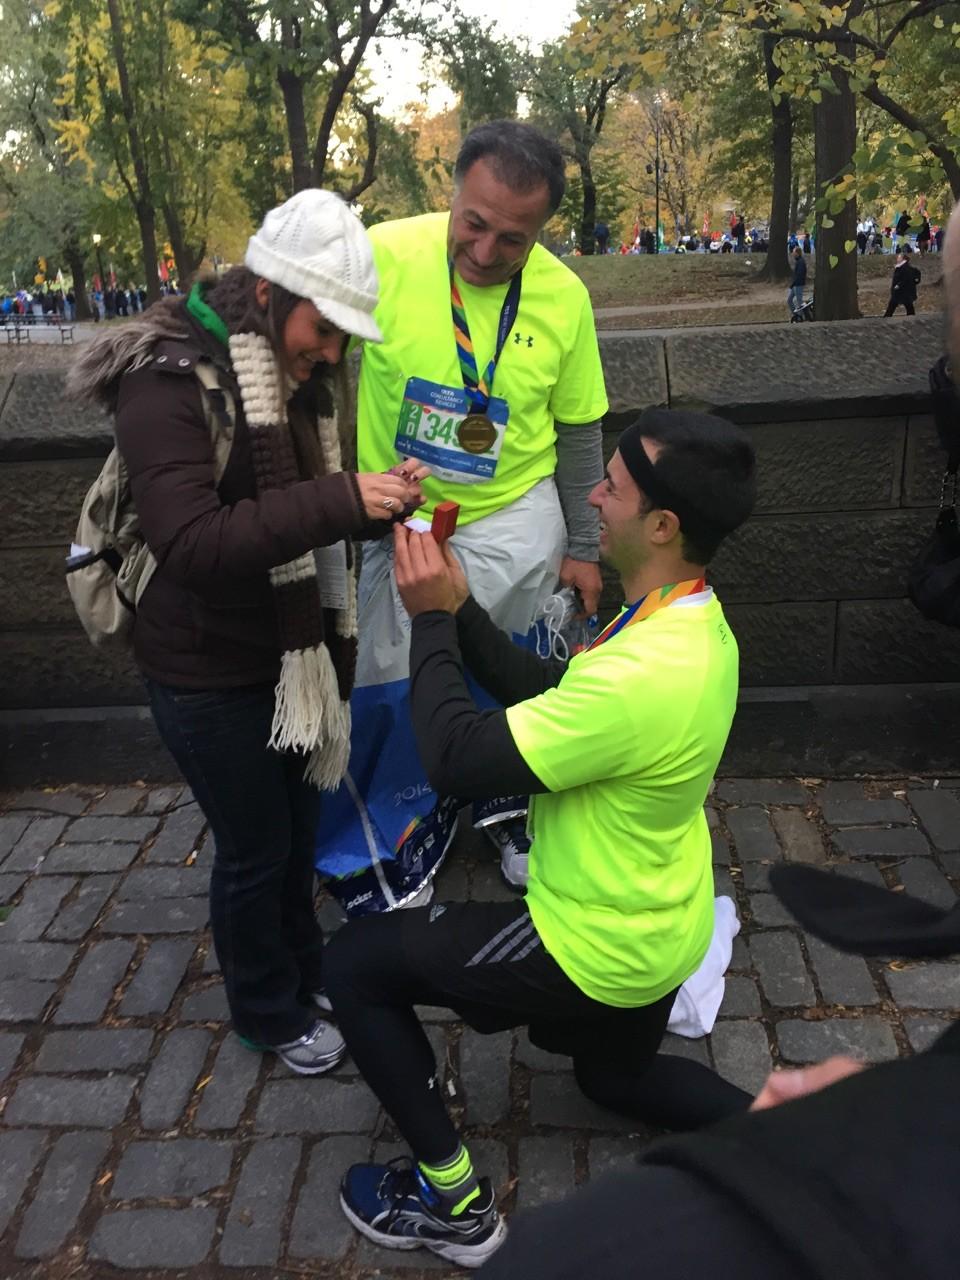 Image 1 of Tina and Freddie   New York City Marathon Proposal